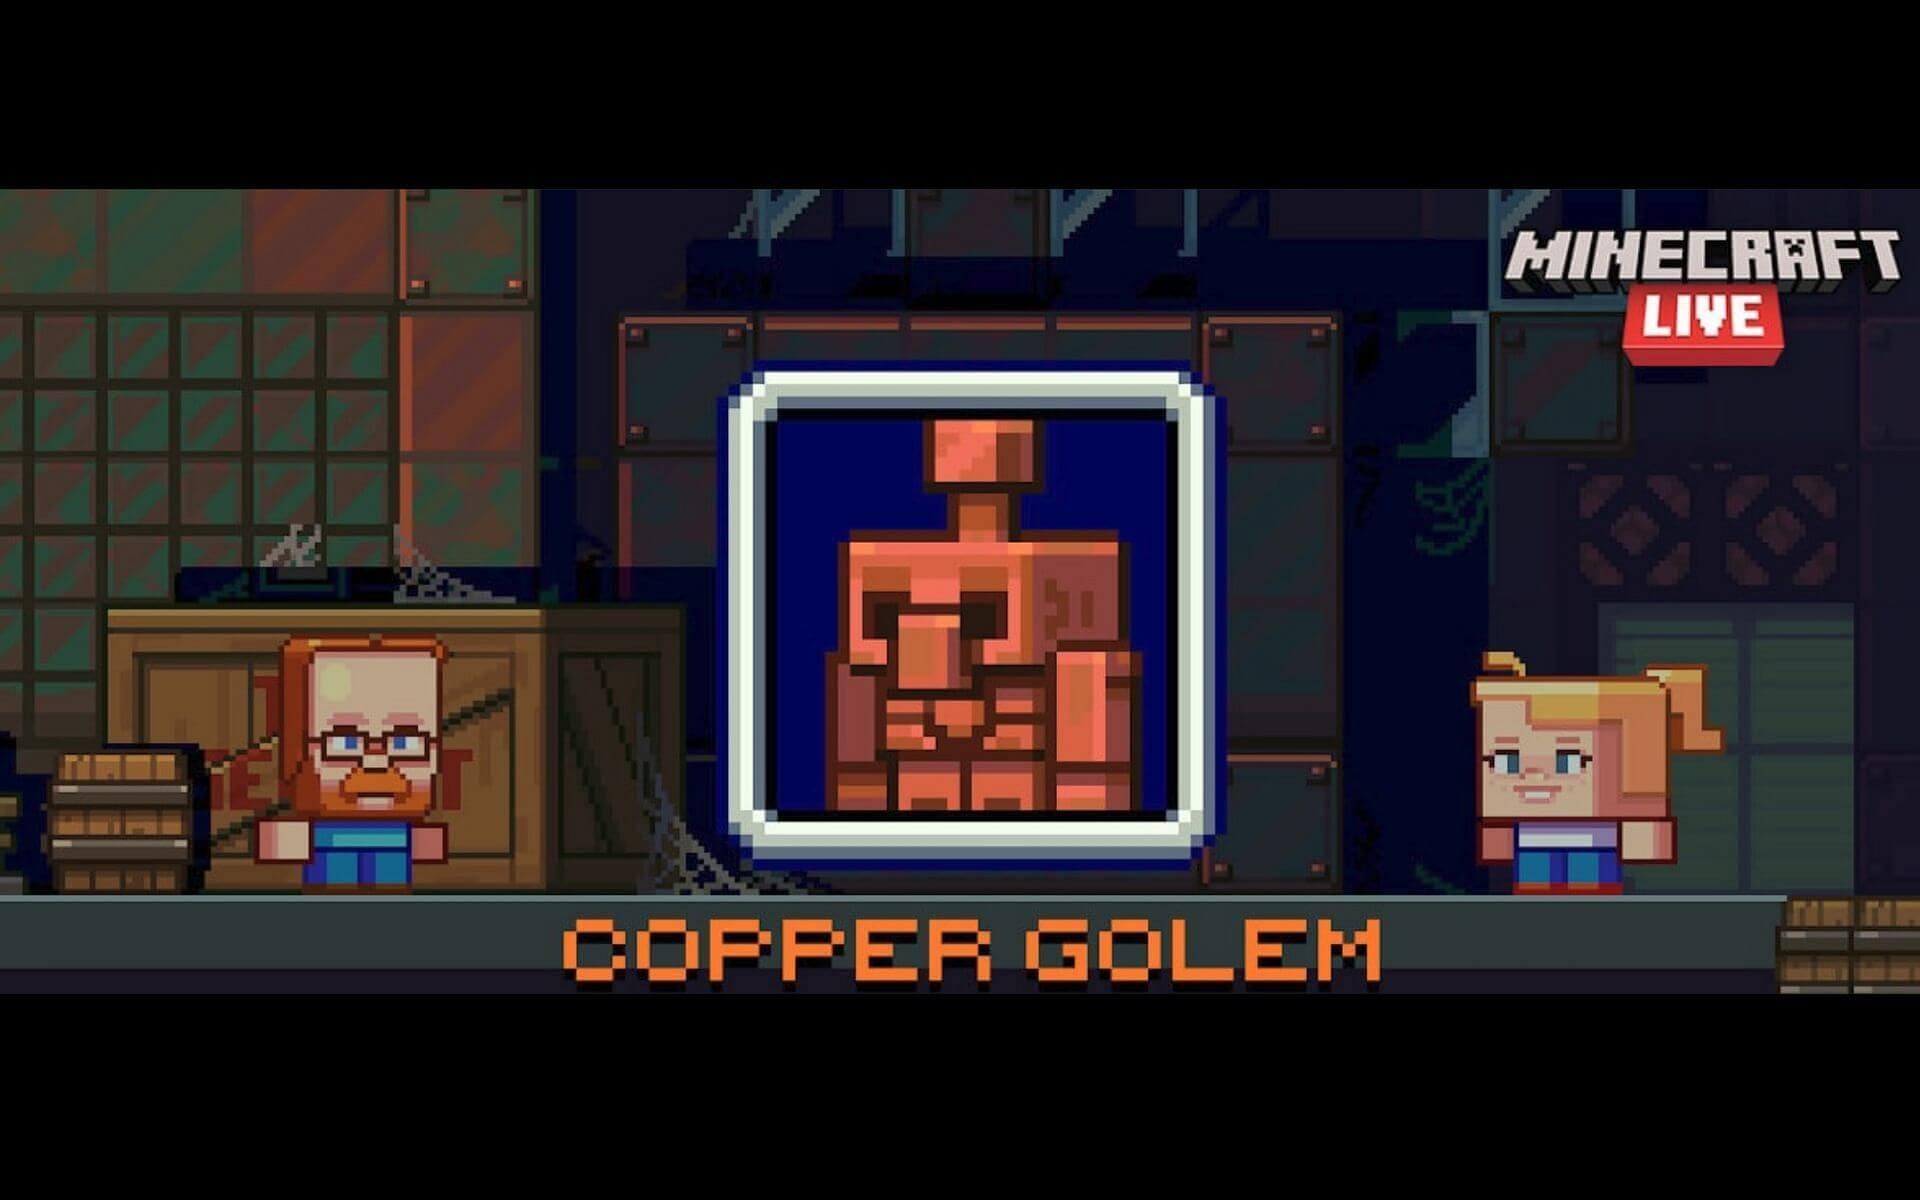 Copper Golem in Minecraft